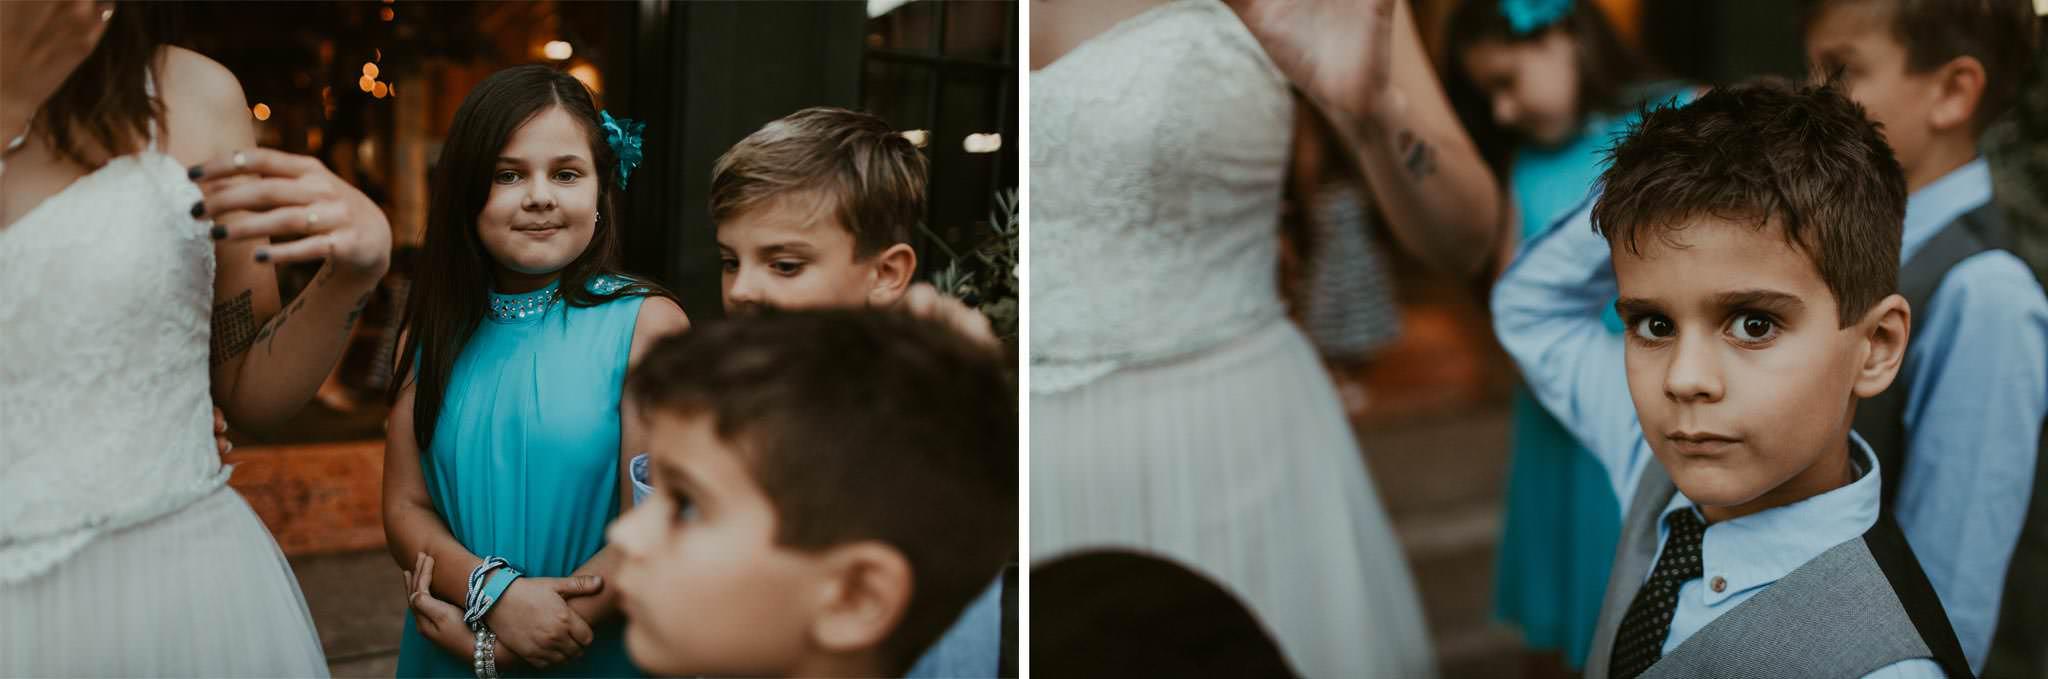 hipster-wedding-london 207